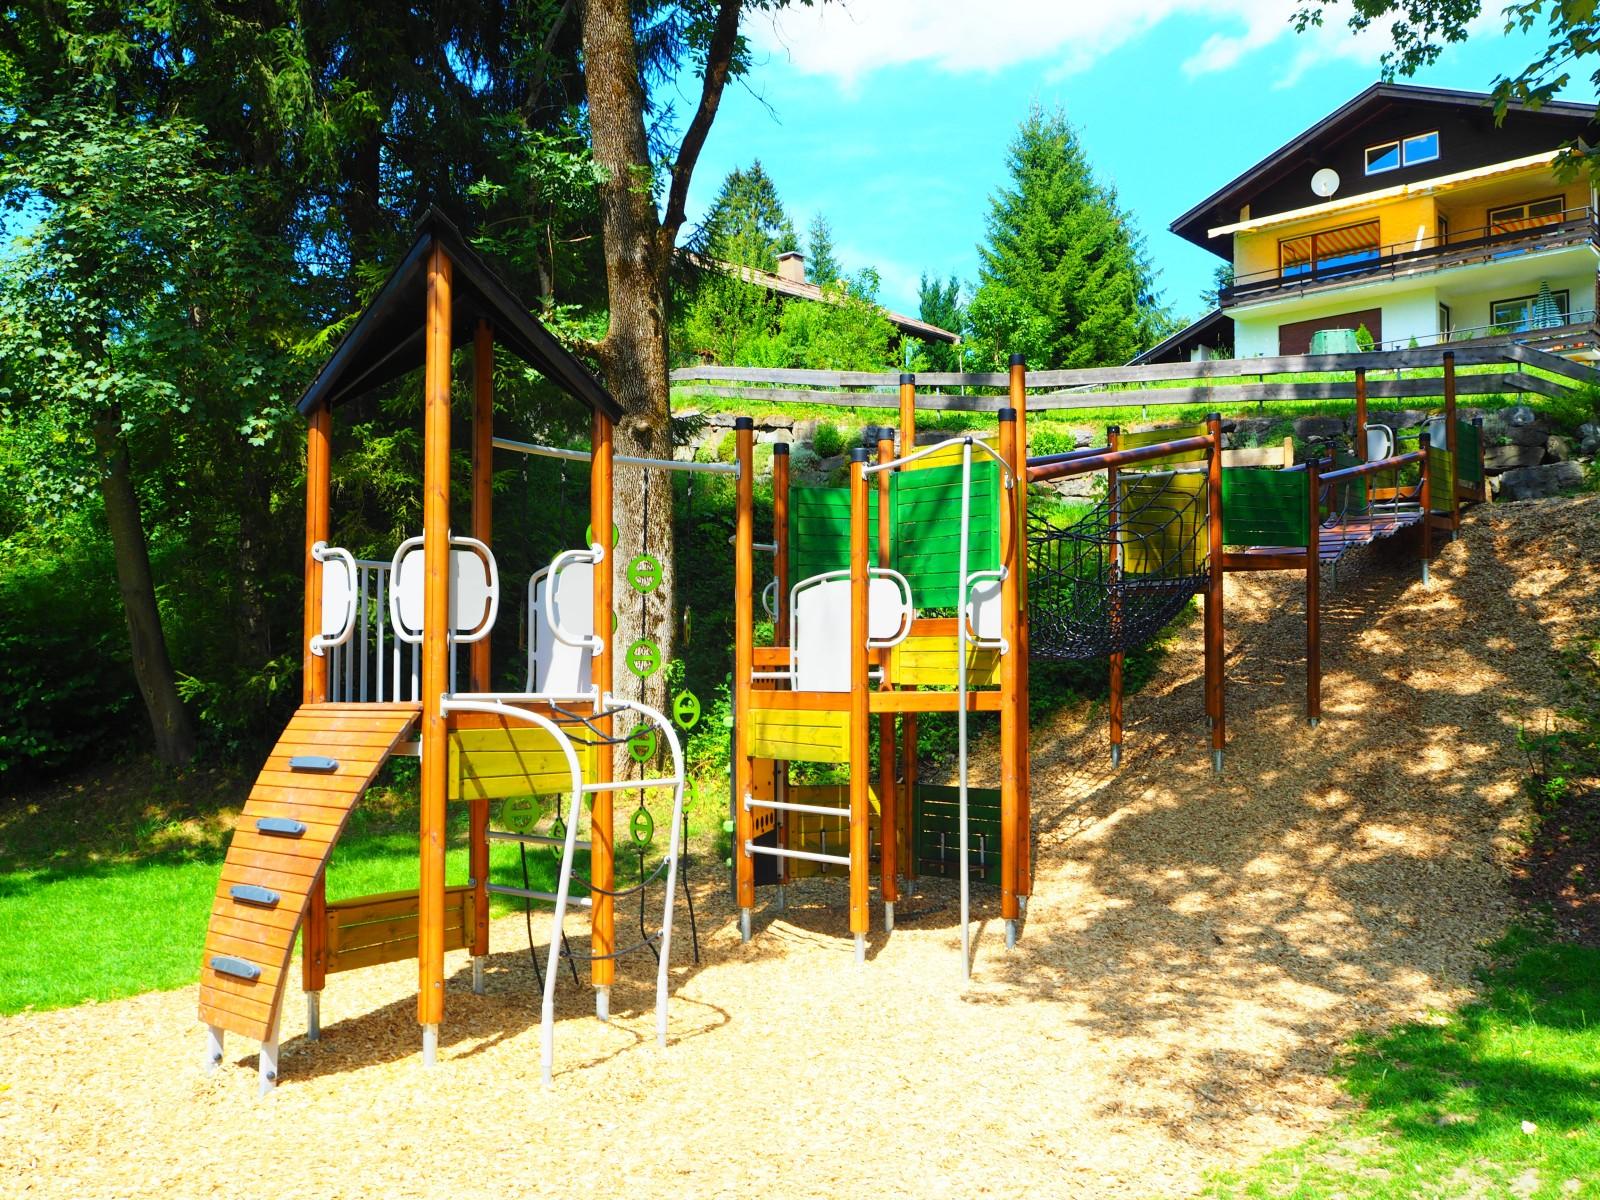 Klettergerüst Traktor : Kinderspielplätze